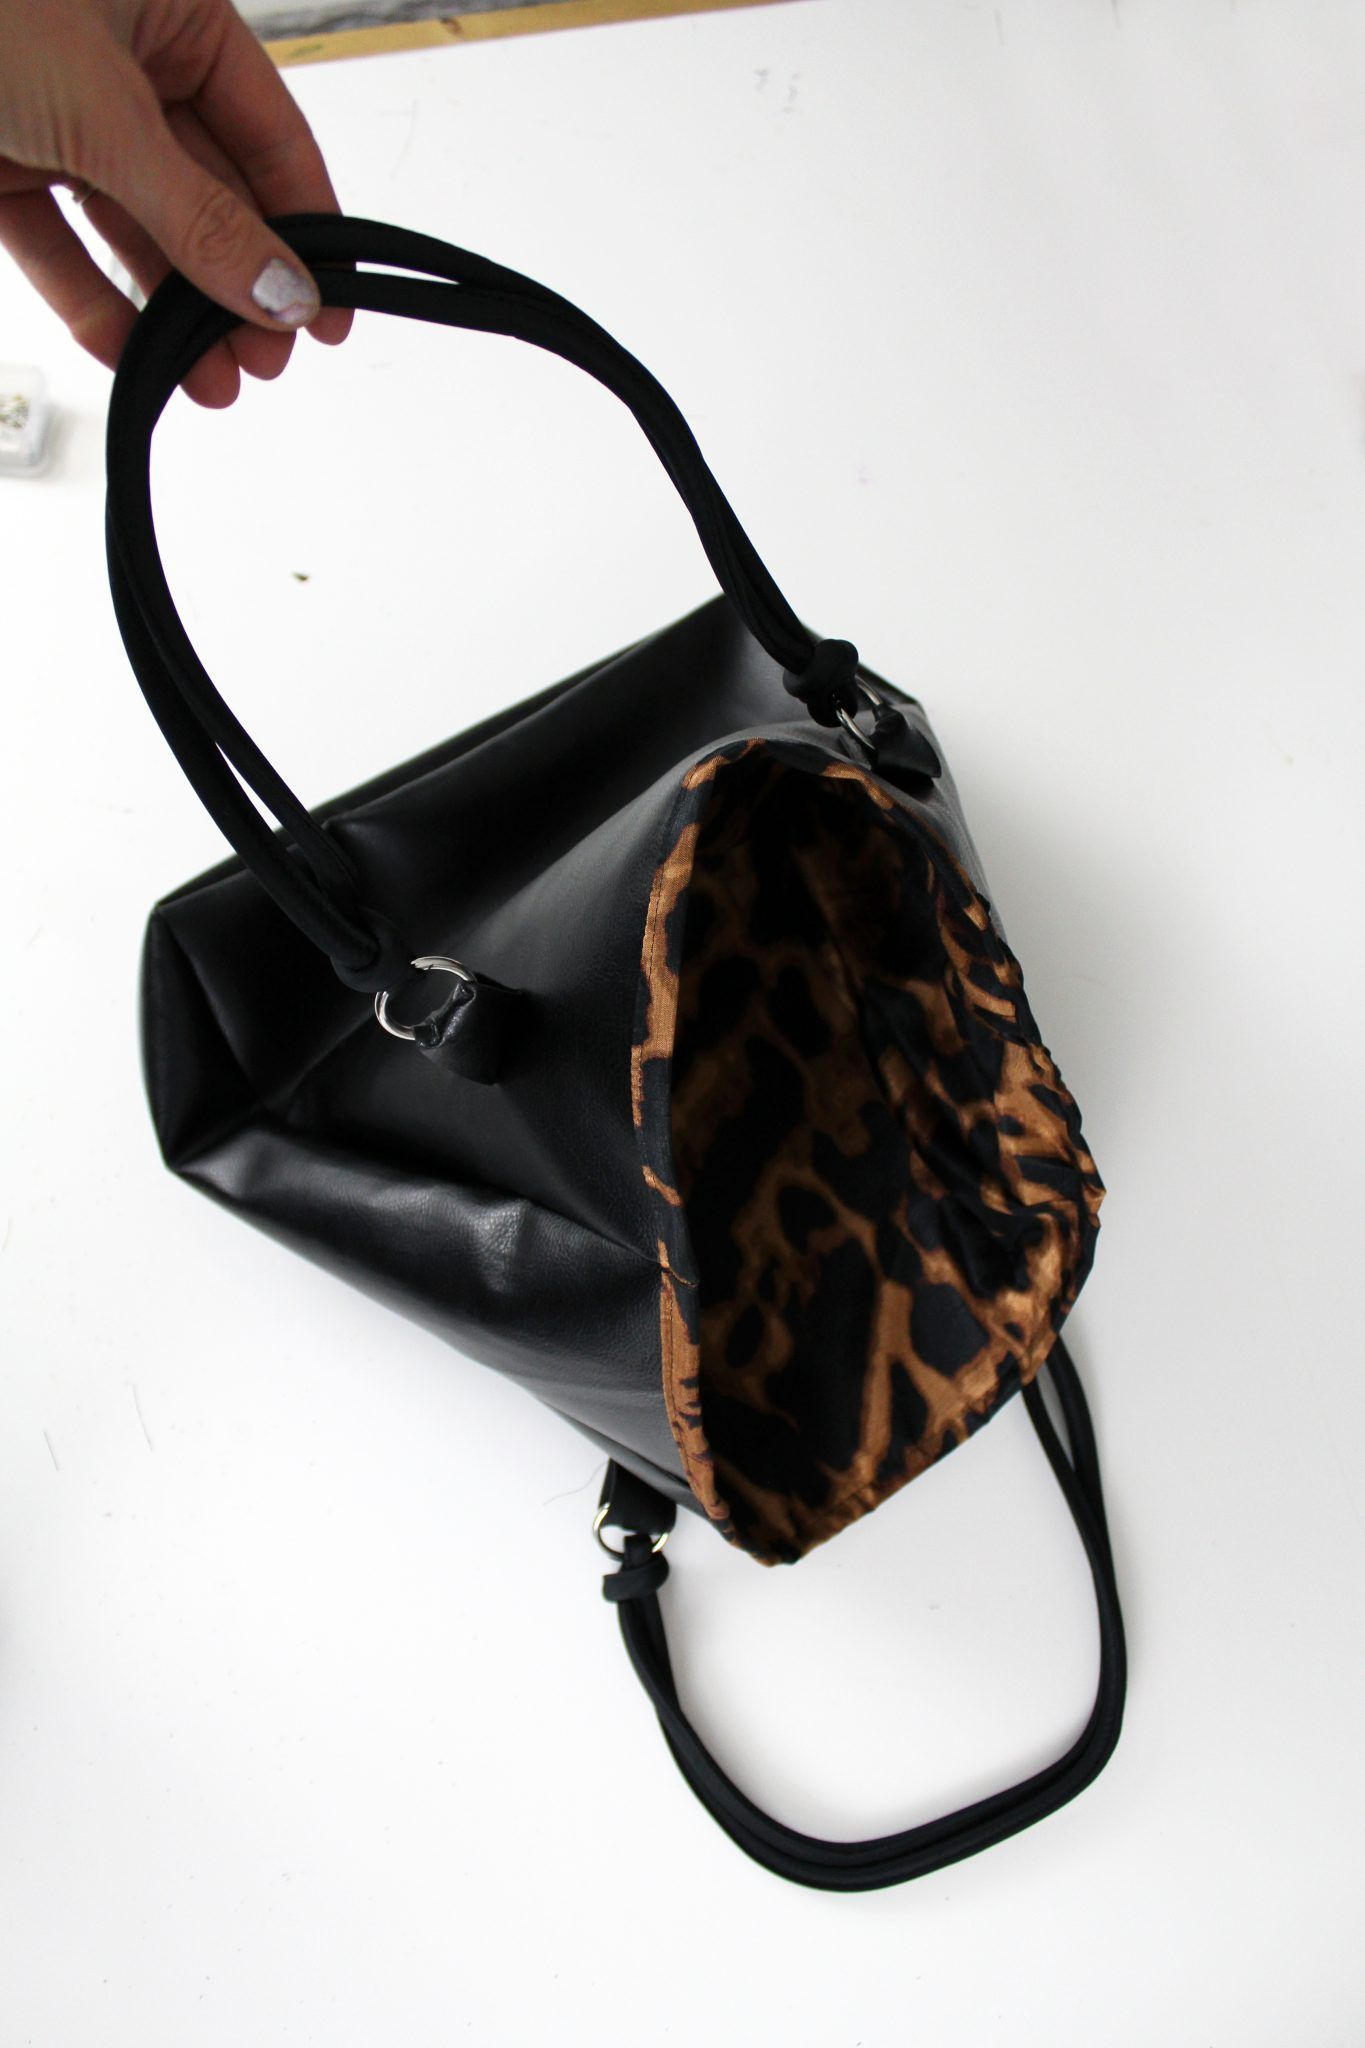 5adb069b6fbd7 How To Make A Leather Bag . DIY Leather Tote Purse